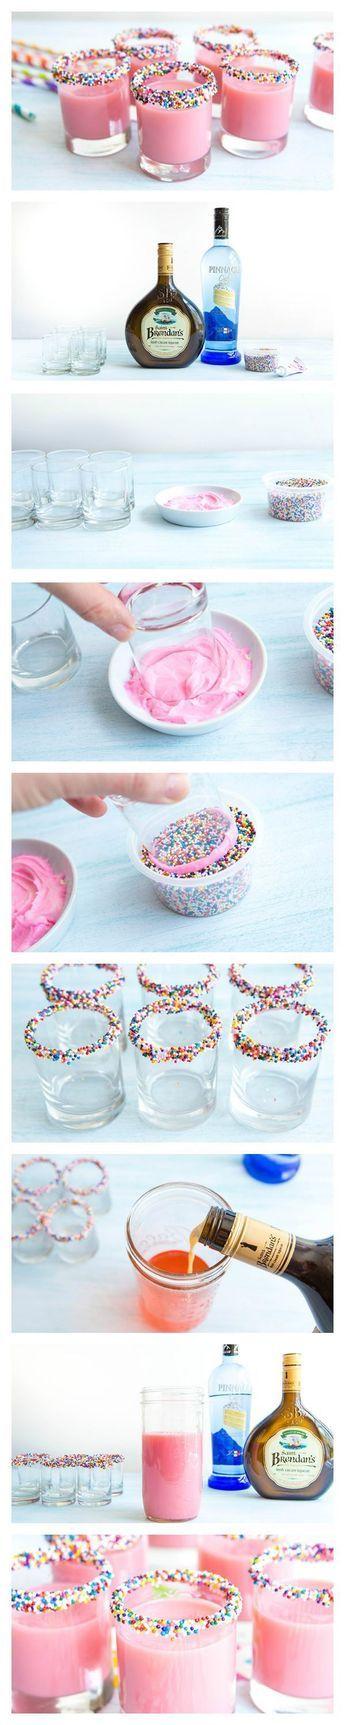 Bright pink shots that taste just like birthday cake!